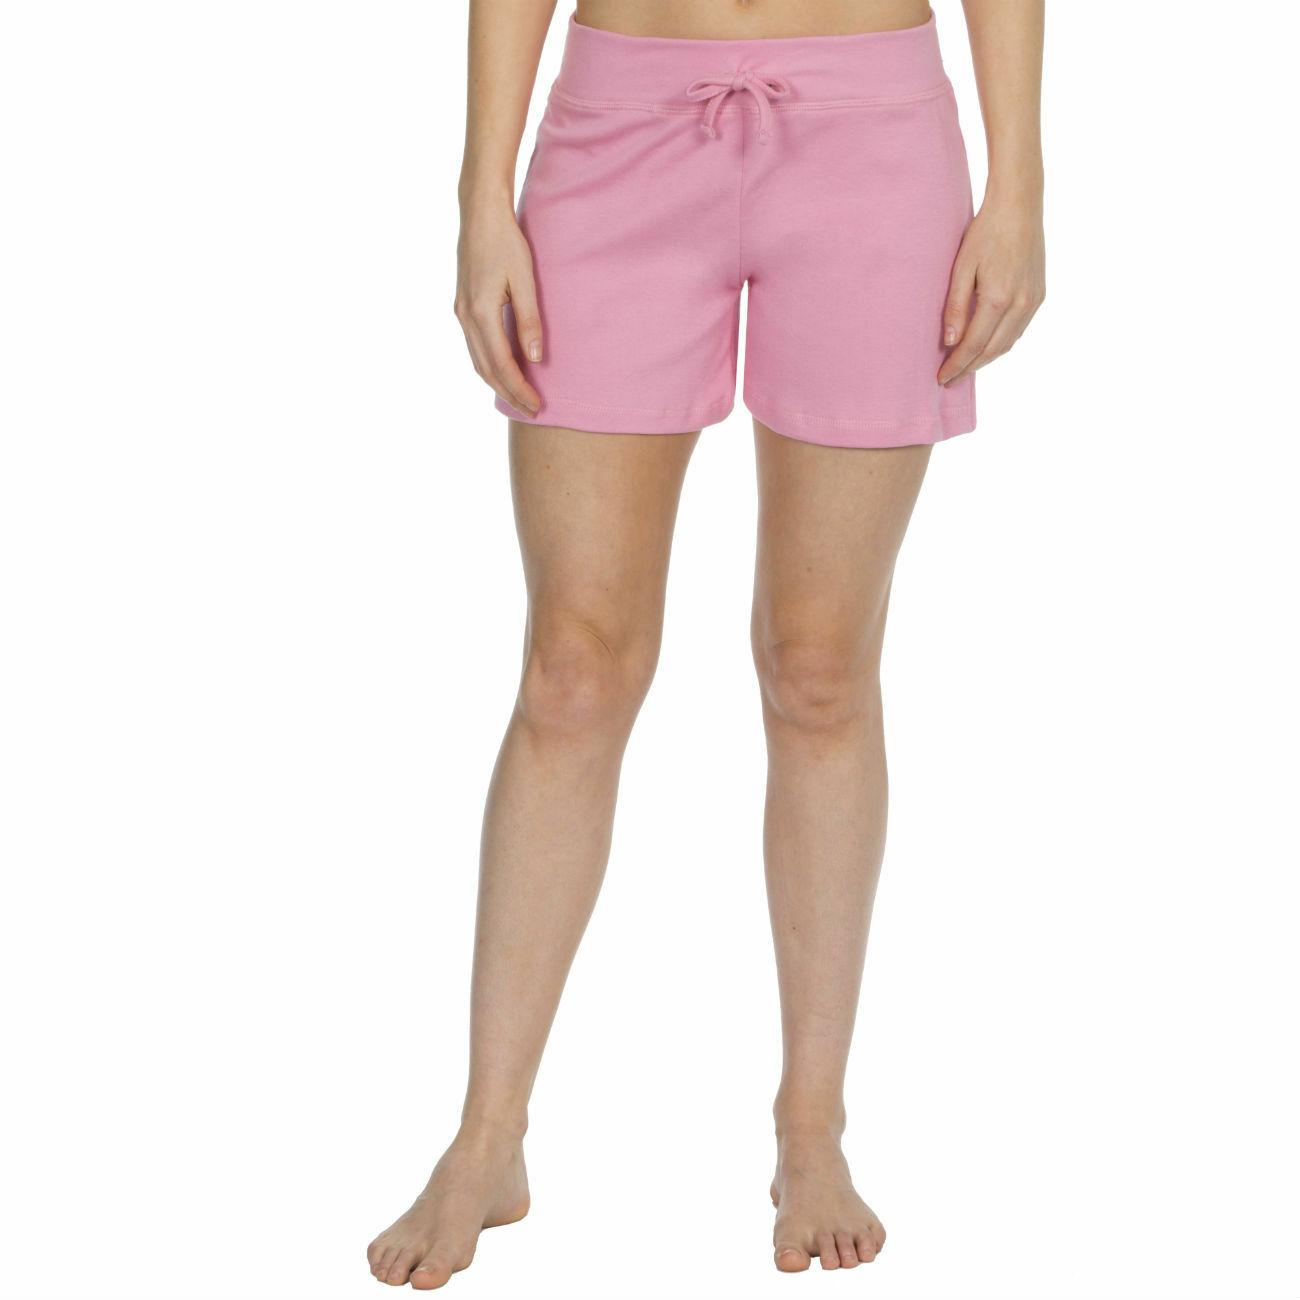 Womens-Cotton-Jersey-Shorts-Elastic-Waist-Summer-Beach-Casual-Yoga-Hot-Pants-New thumbnail 16